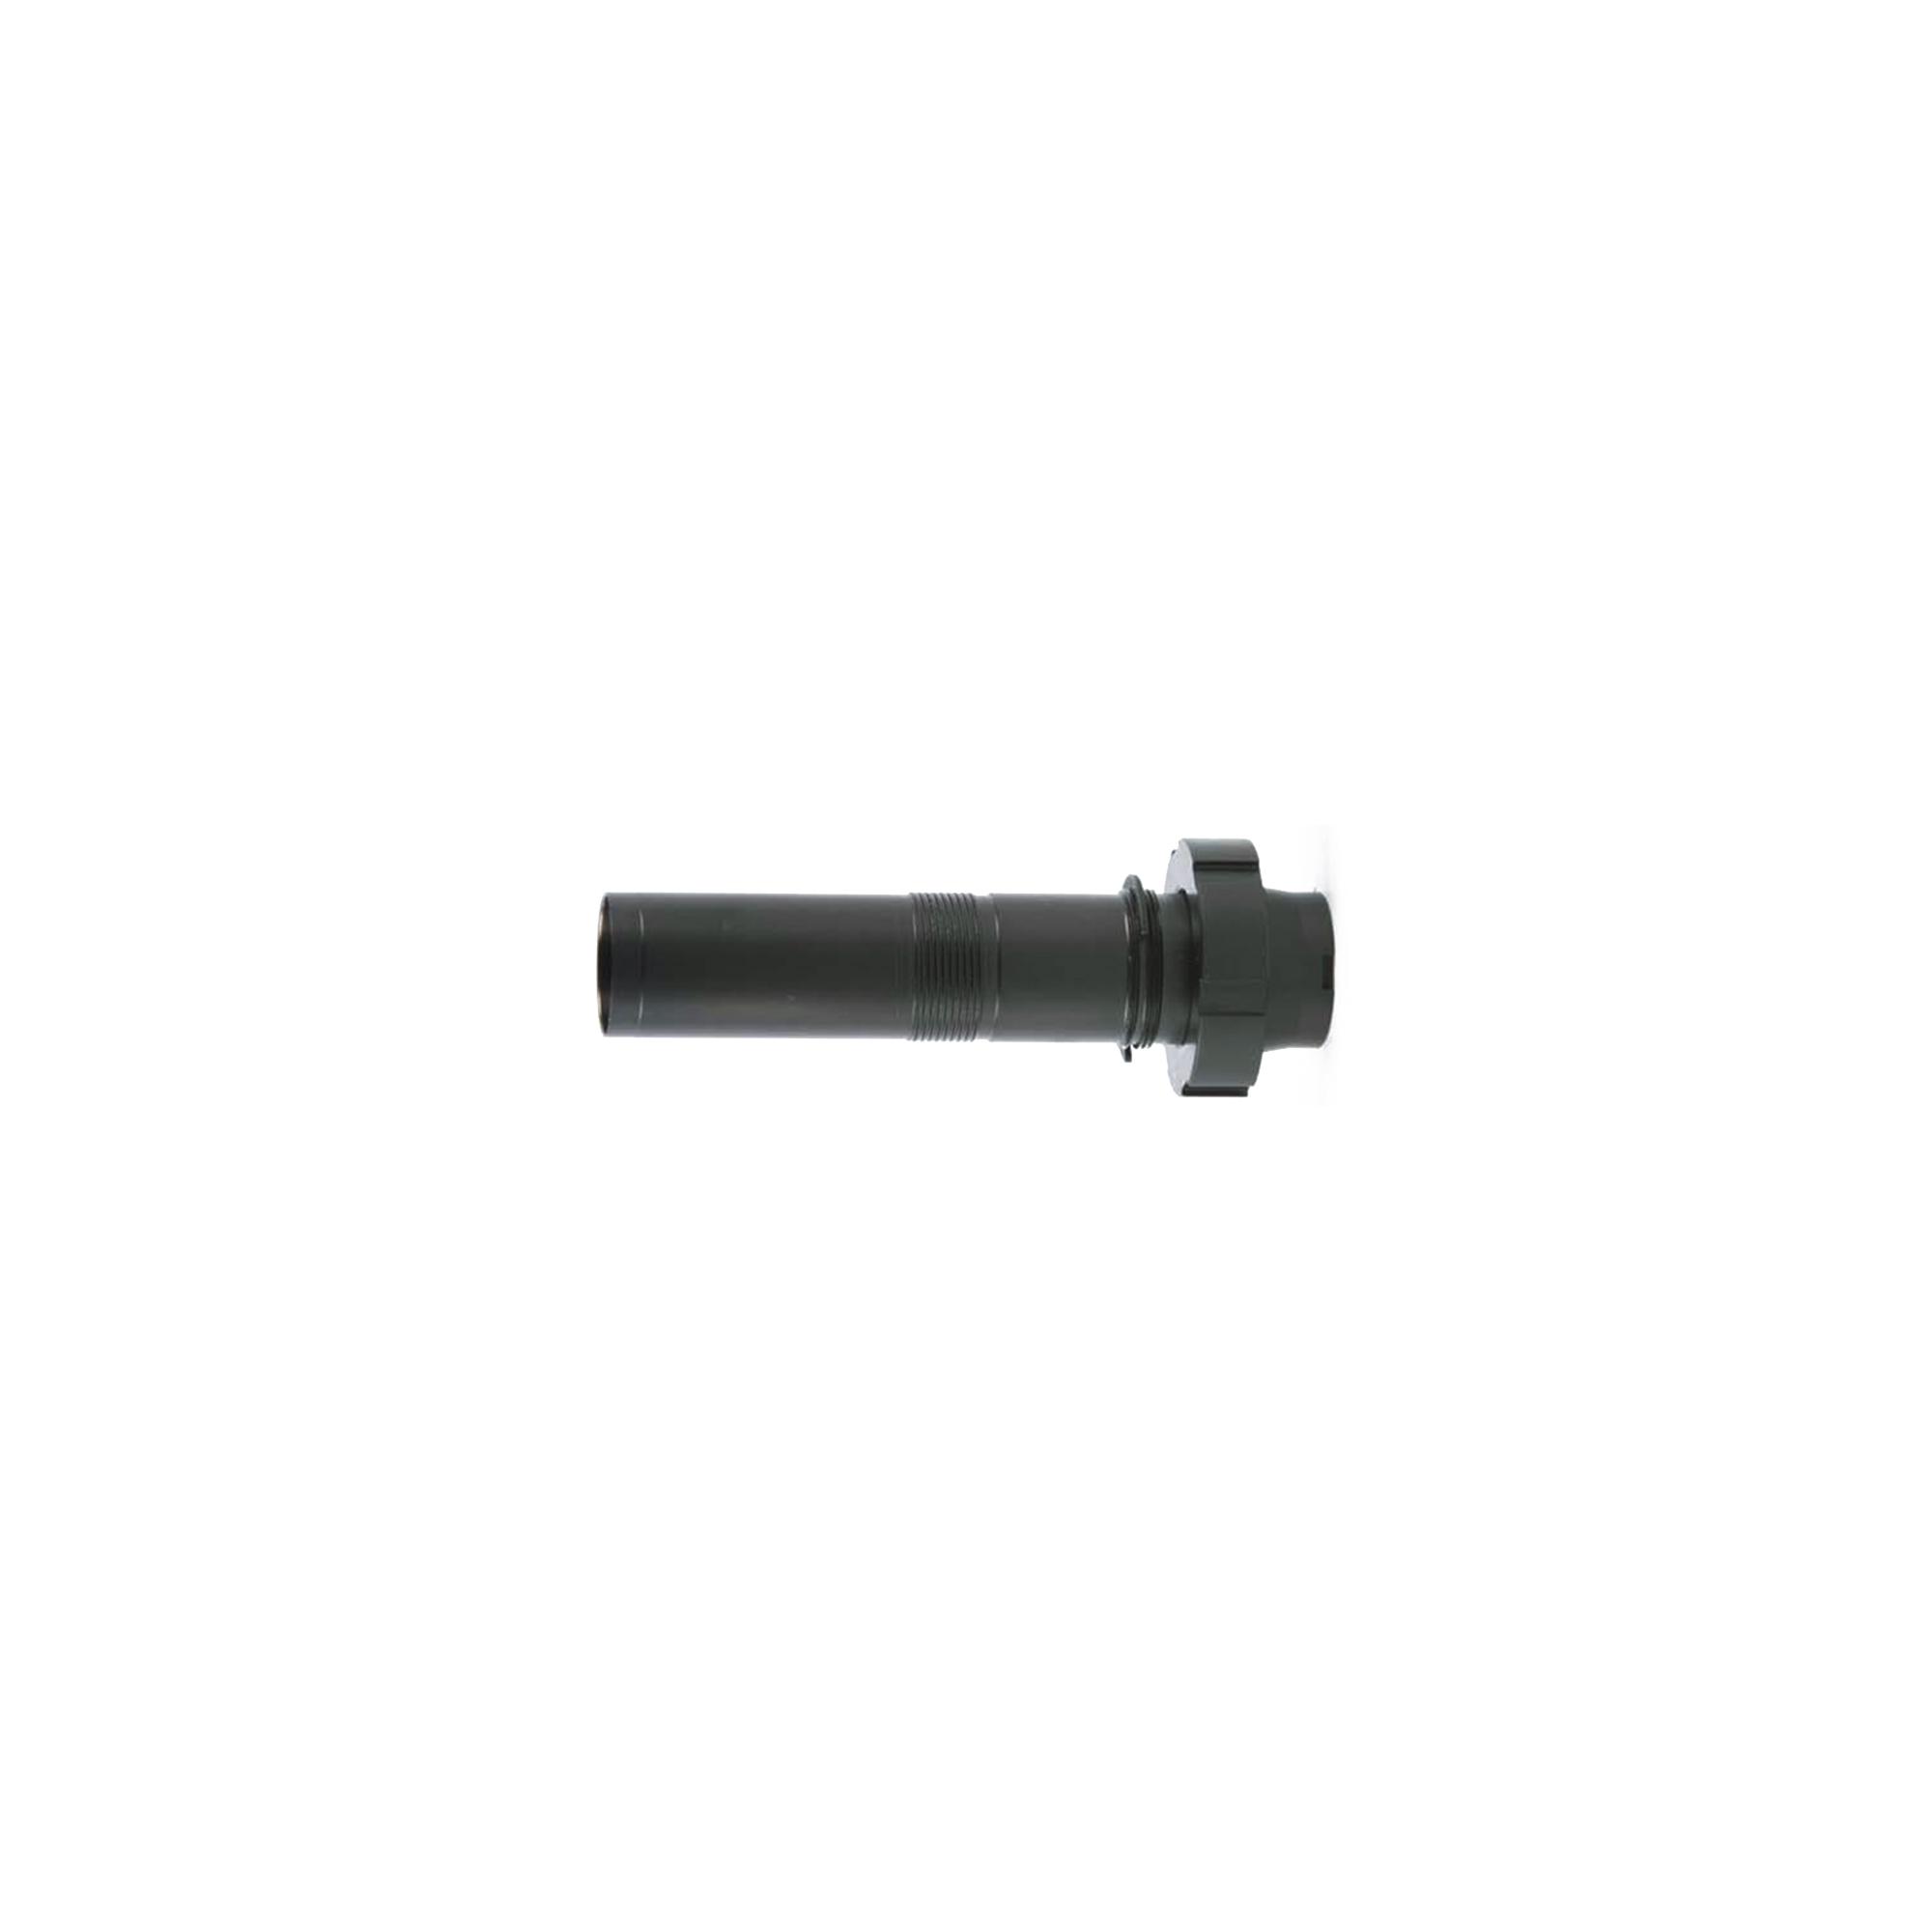 Choke adapter for Saiga/KSG shotguns.